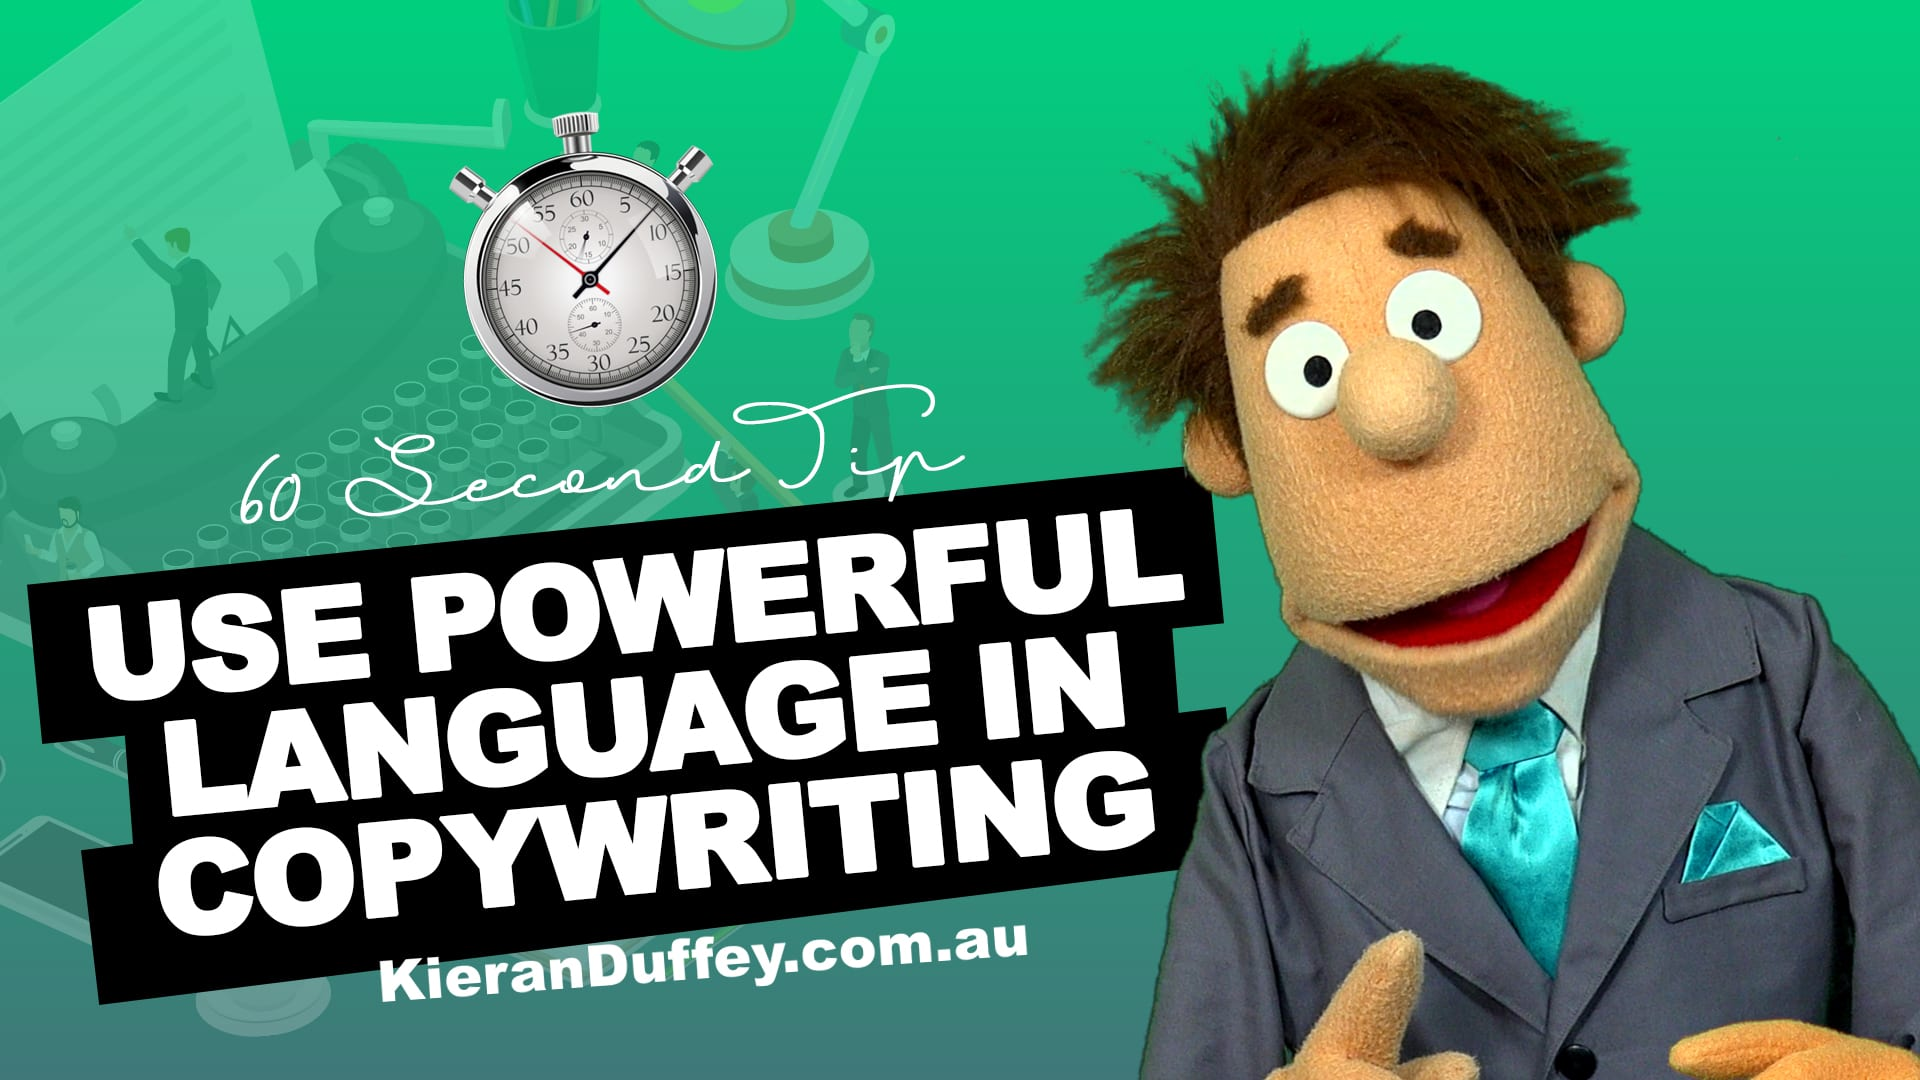 Video explaining using powerful language in copywriting